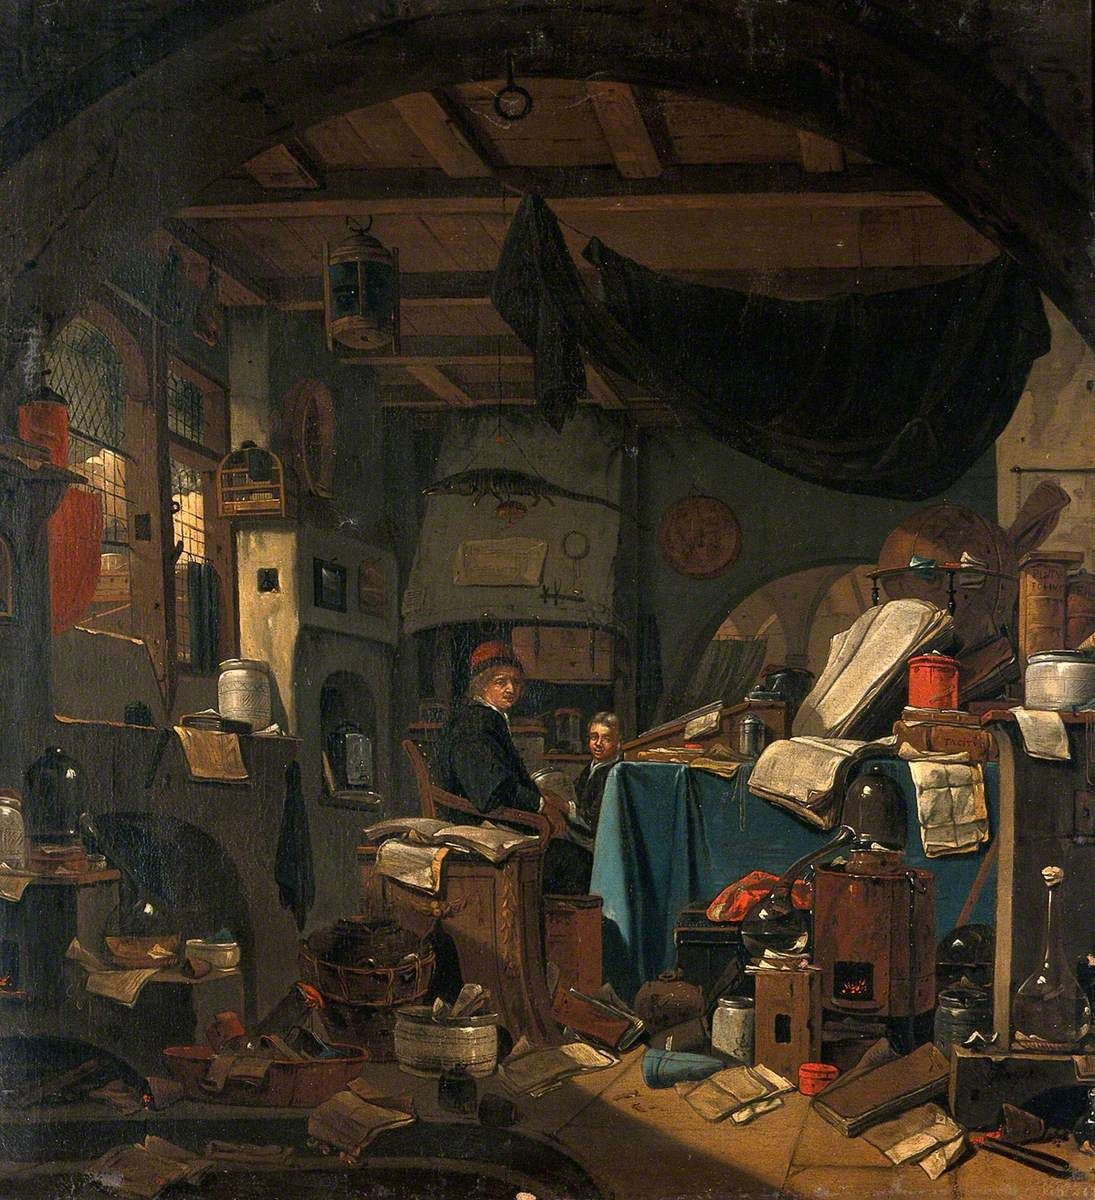 Thomas Wyck ou Thomas Wijck ou Thomas Wijk (1616